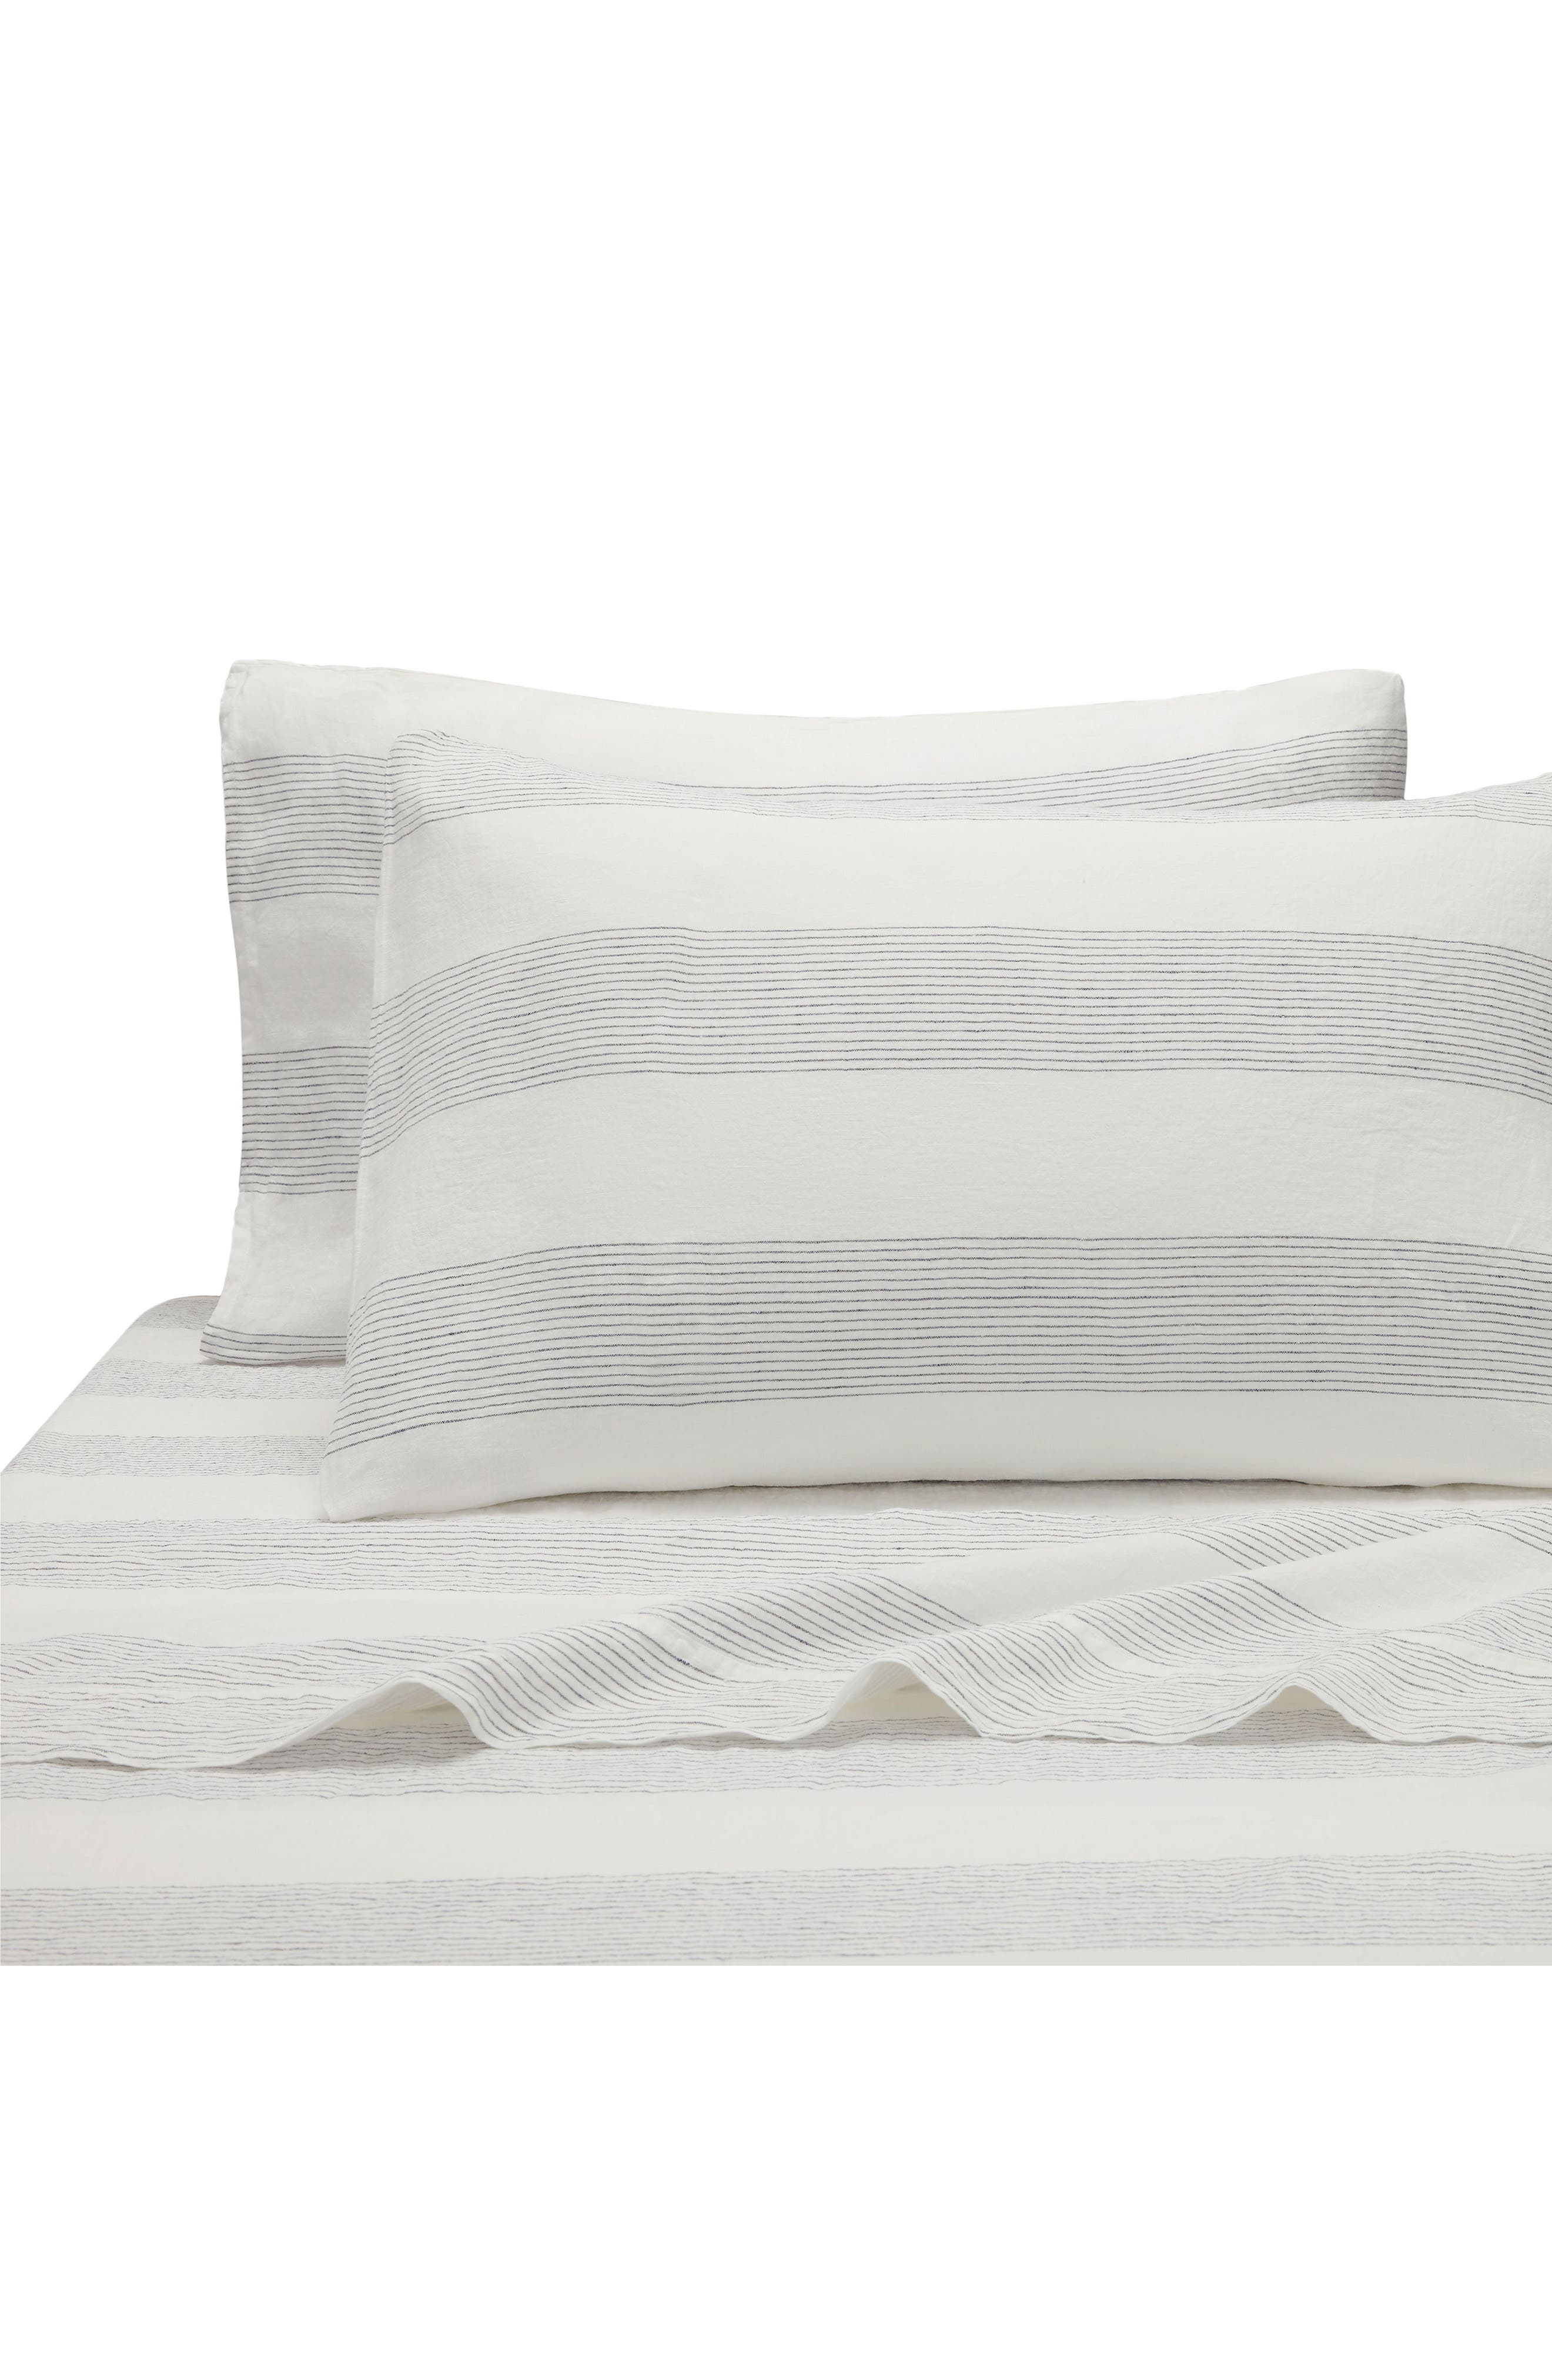 Amagansett Linen 300 Thread Count Pillowcase,                         Main,                         color, 100